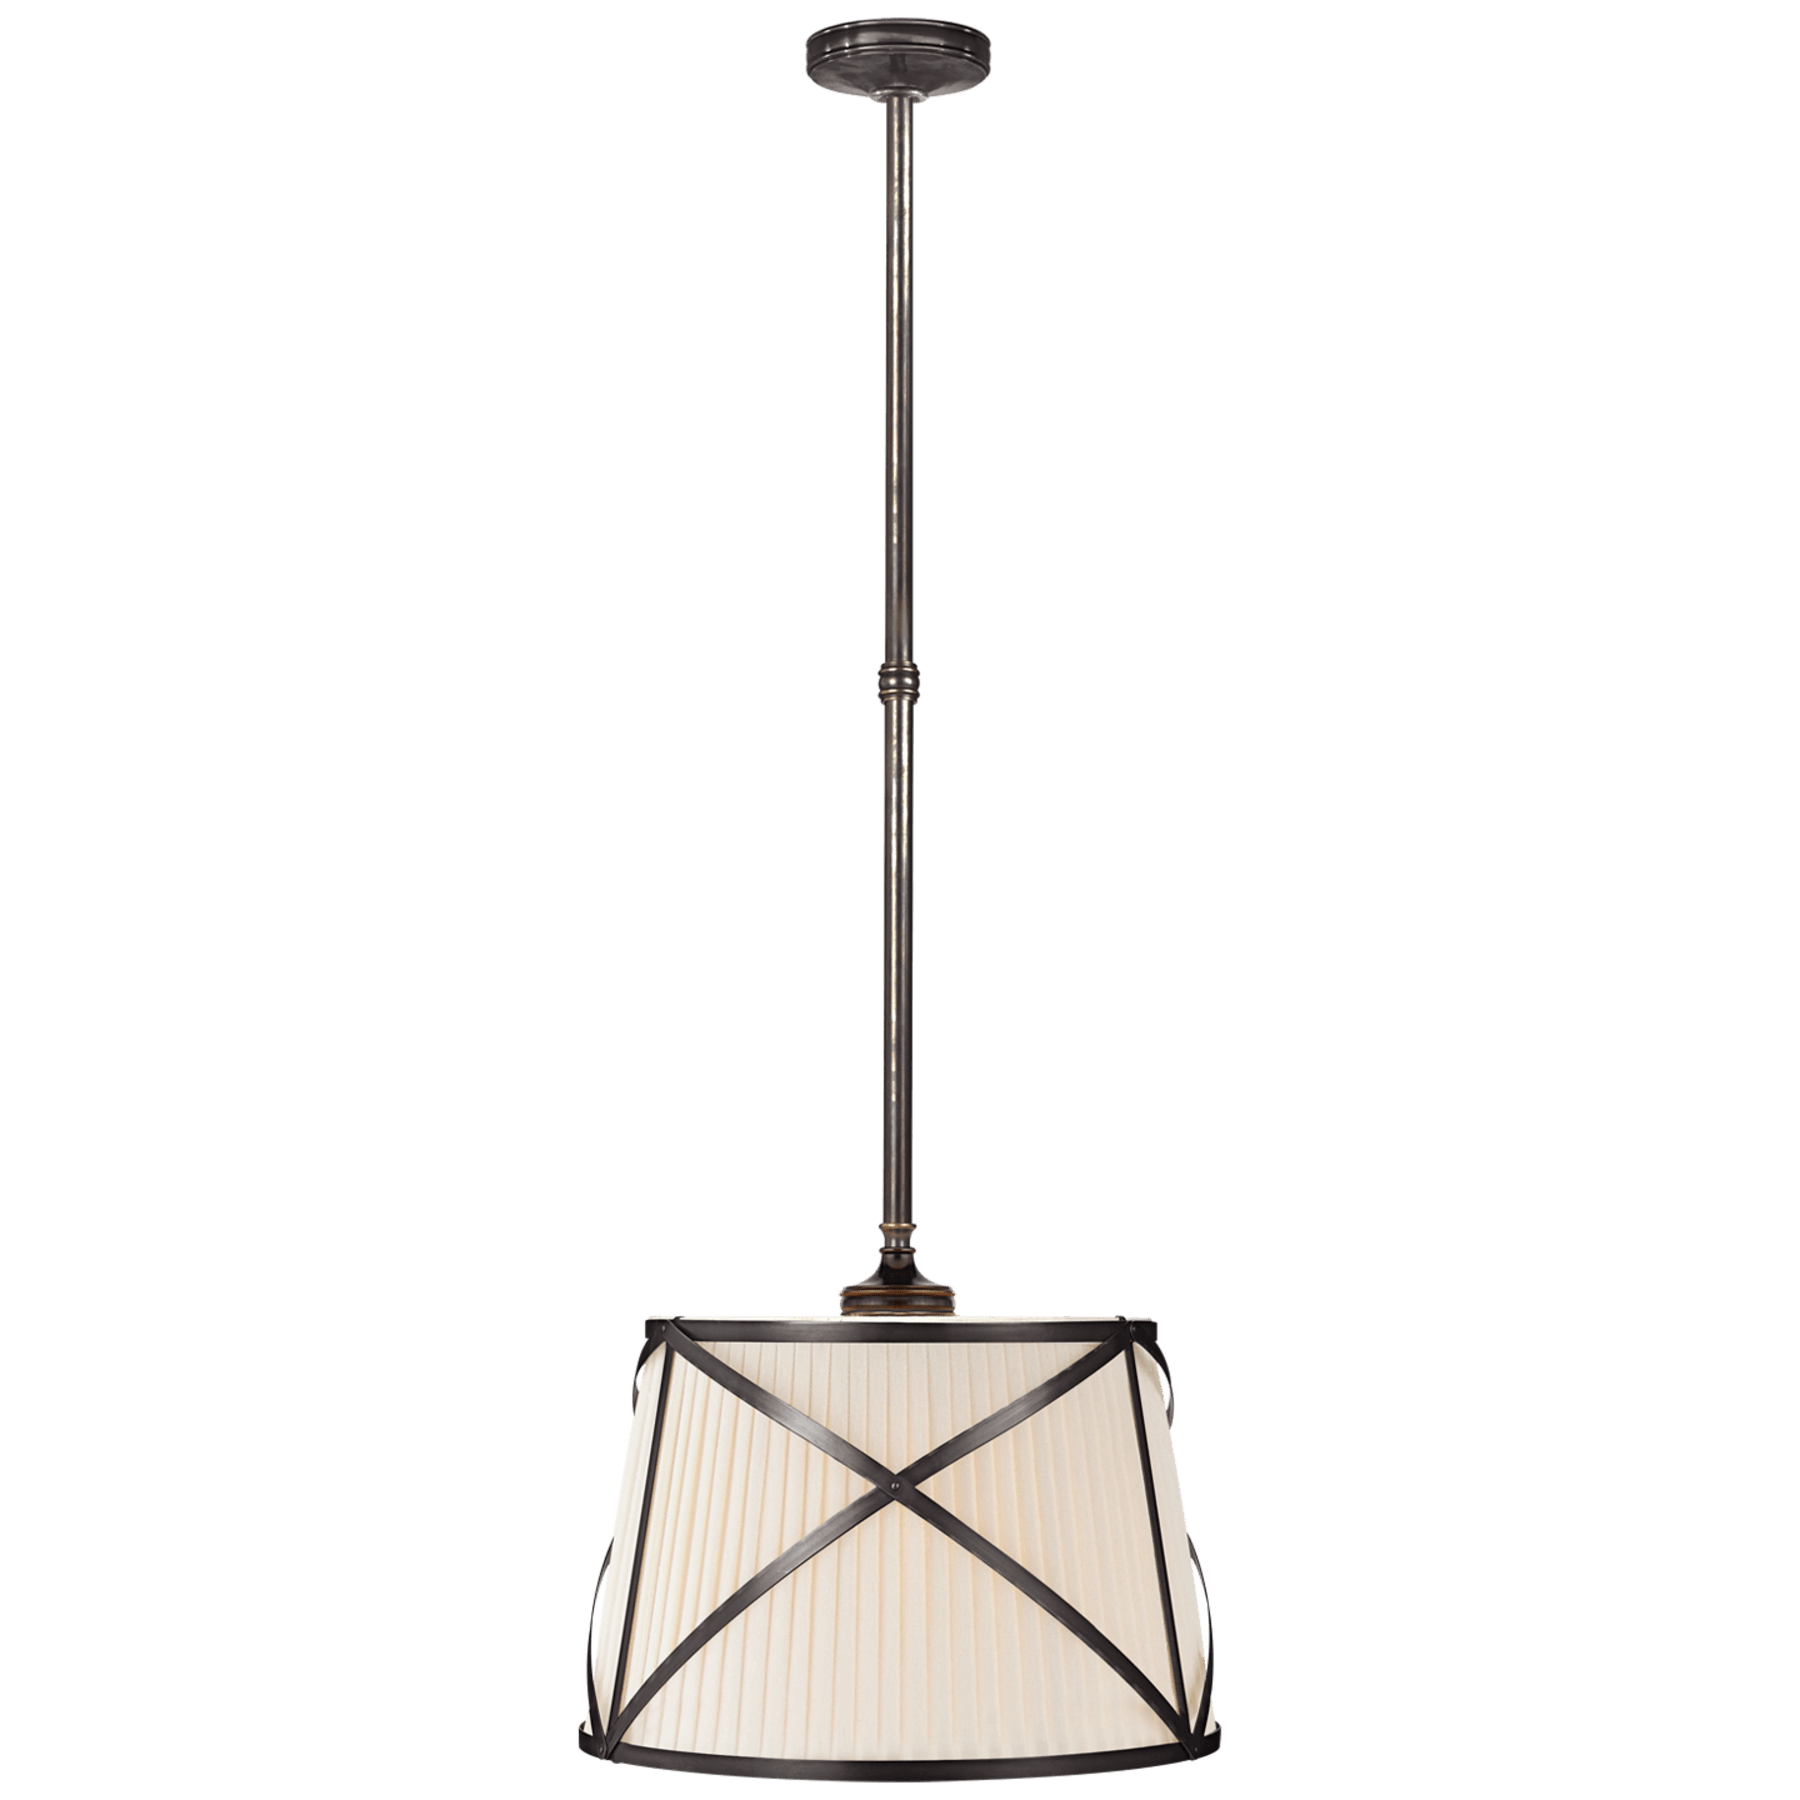 Grosvenor Single Hanging Shade Hanging Shade Ceiling Circa Lighting